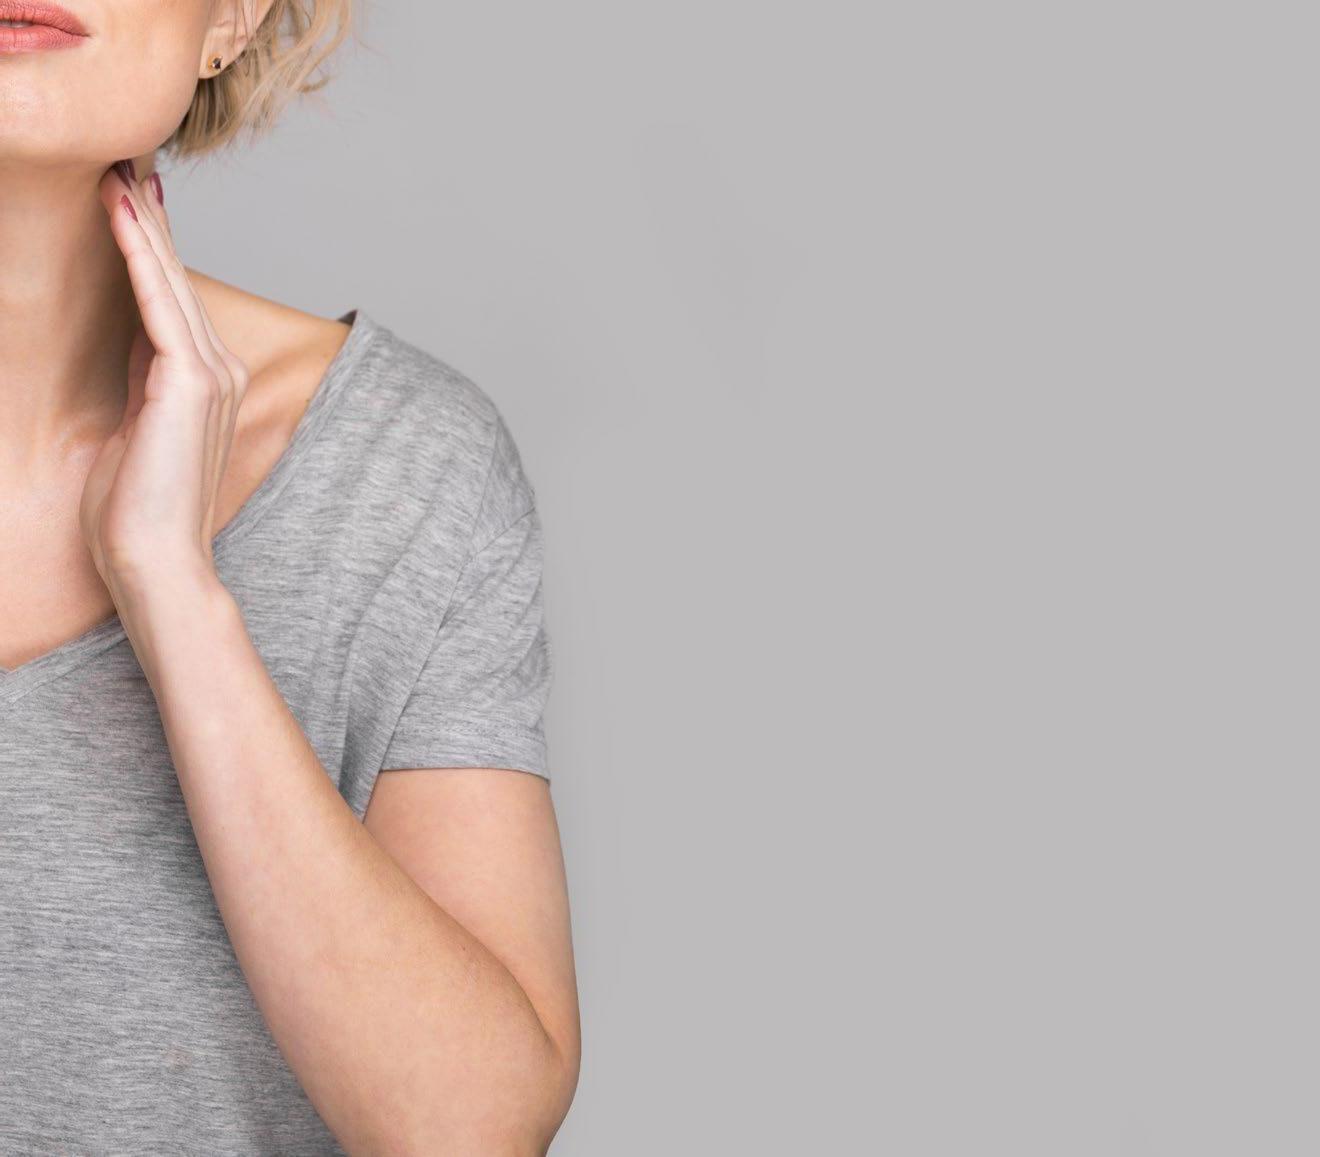 Page 12 of Dr. Emily Lipinski: Thyroid Disease is Skyrocketing